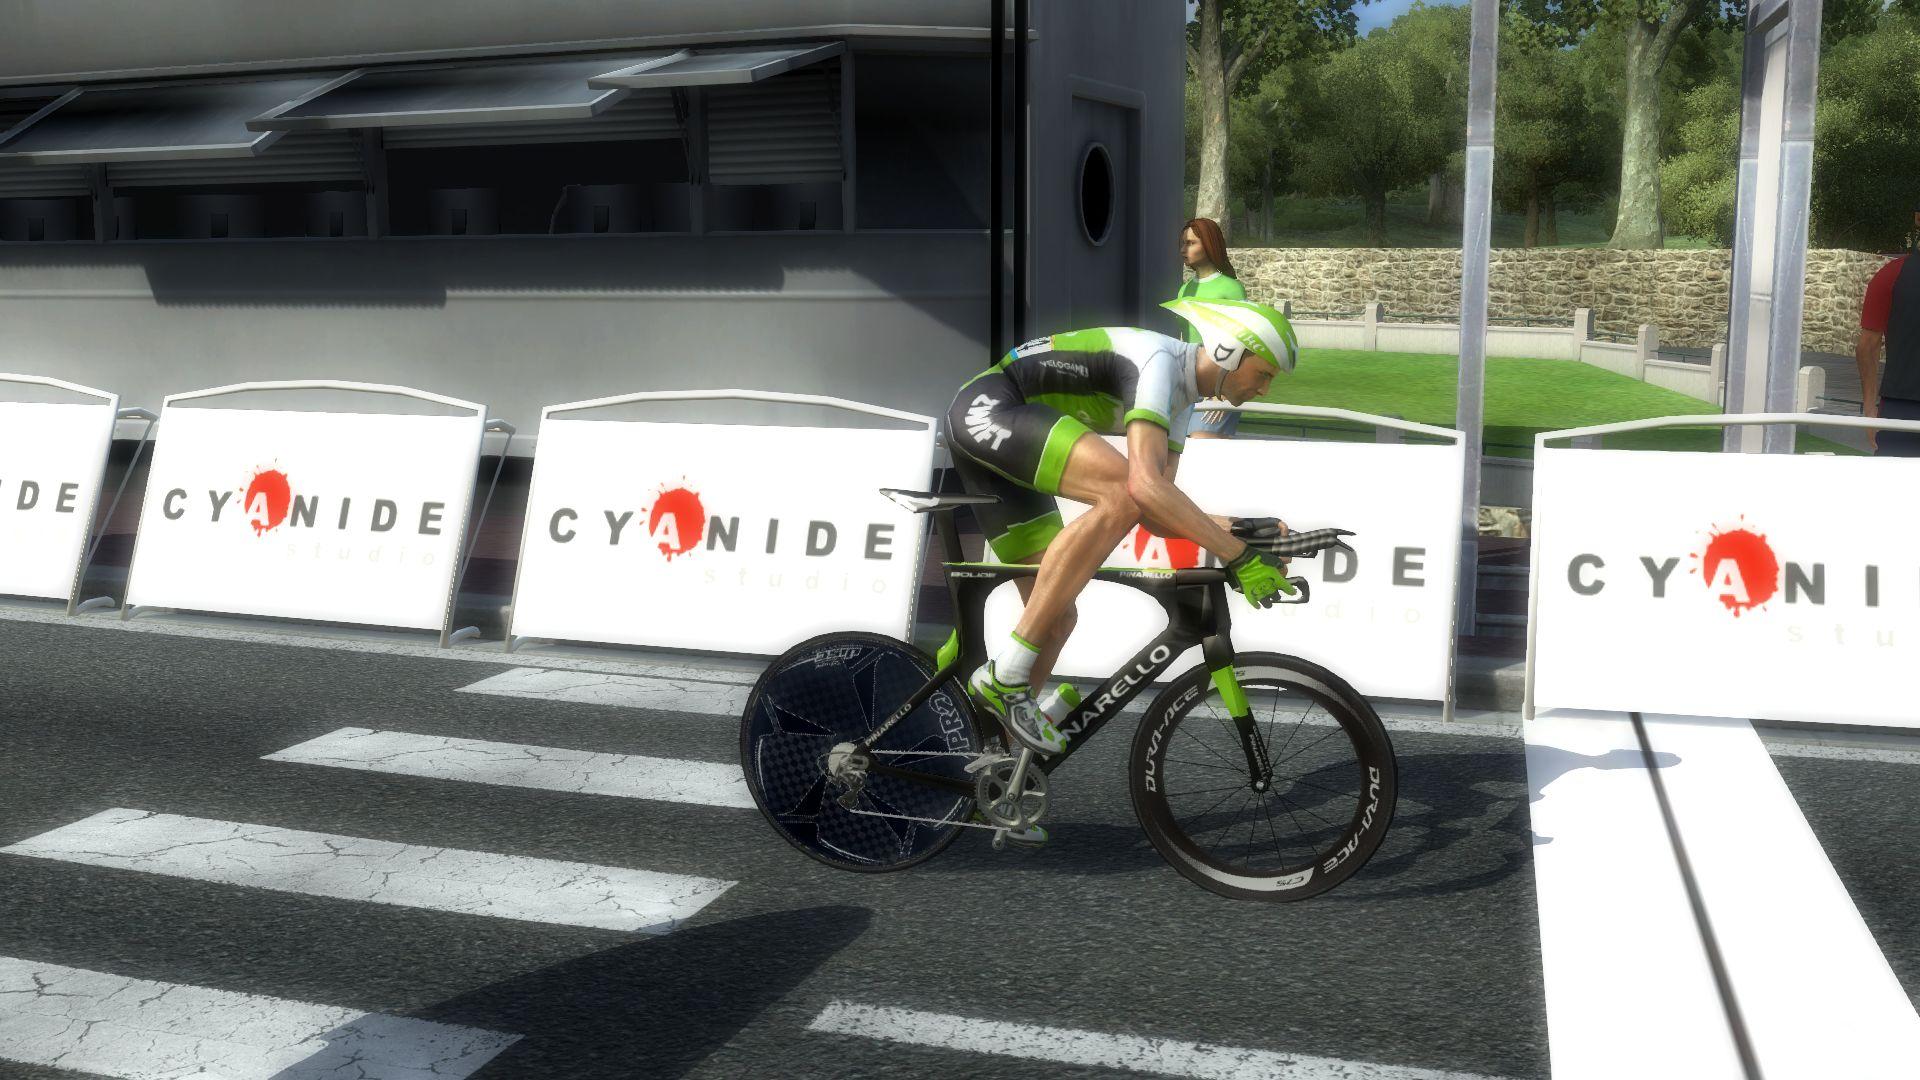 pcmdaily.com/images/mg/2019/Races/C1/Bayern/S4/mg19_bay_s04_42.jpg